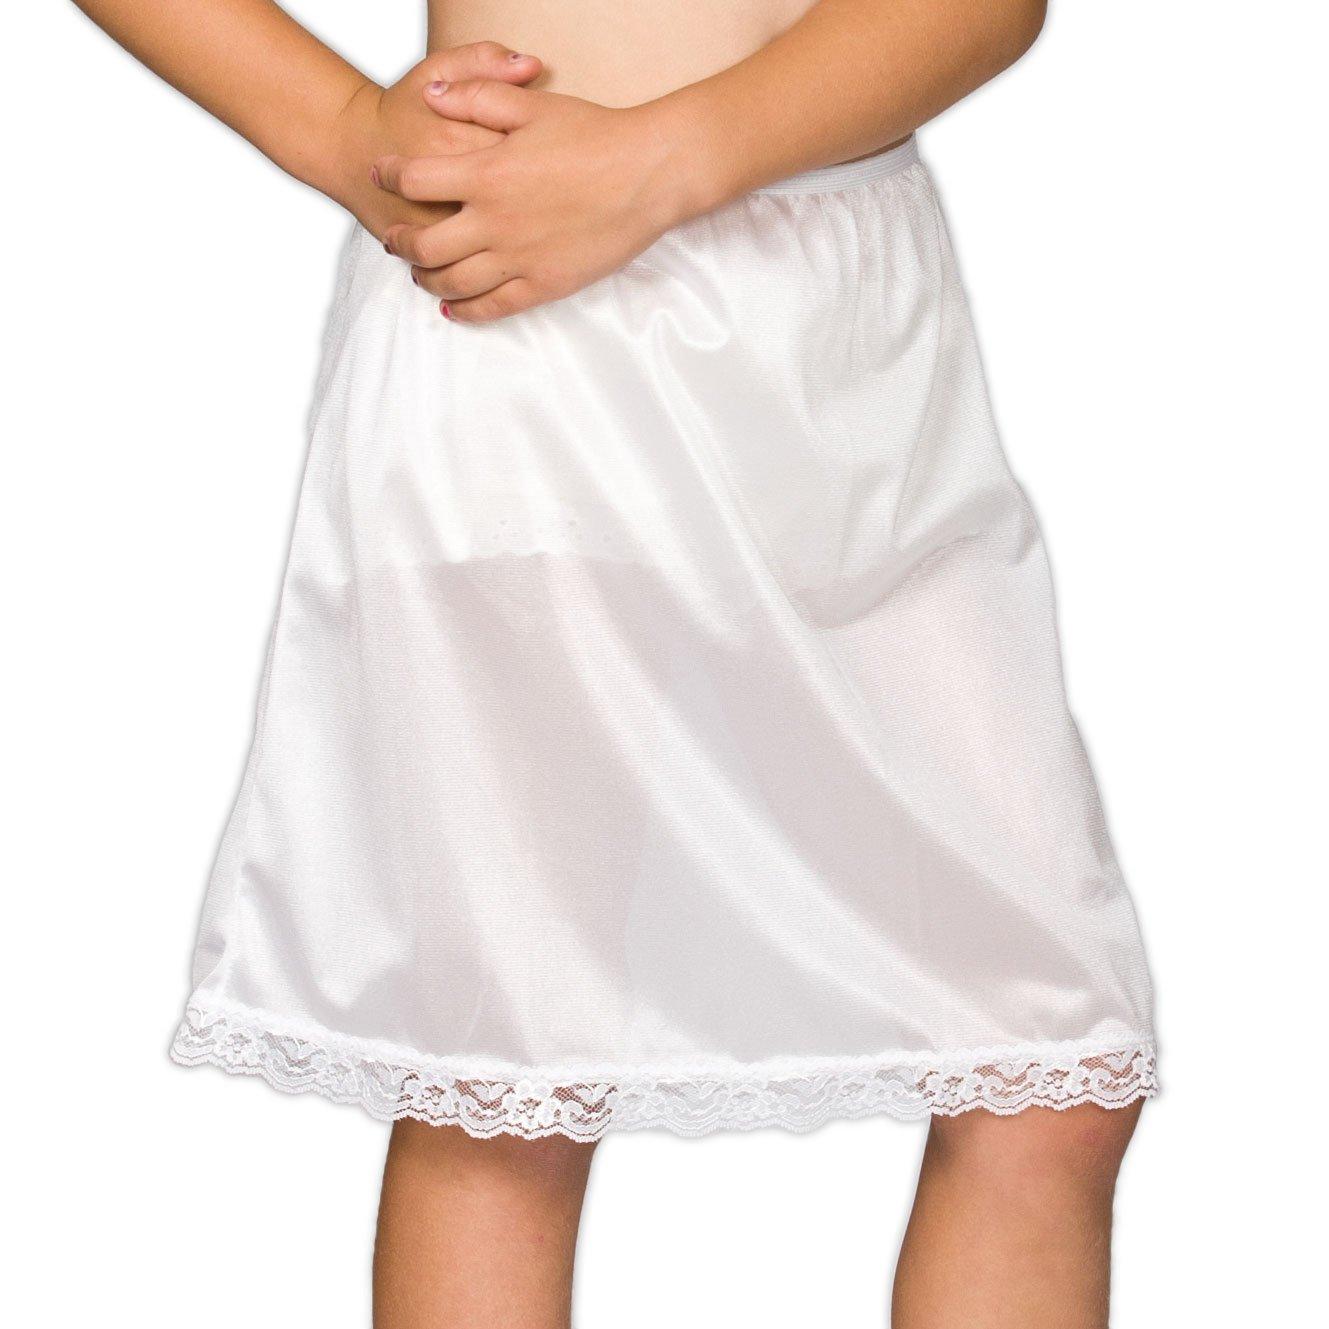 I.C. Collections Big Girls White Nylon Half Slip, 8